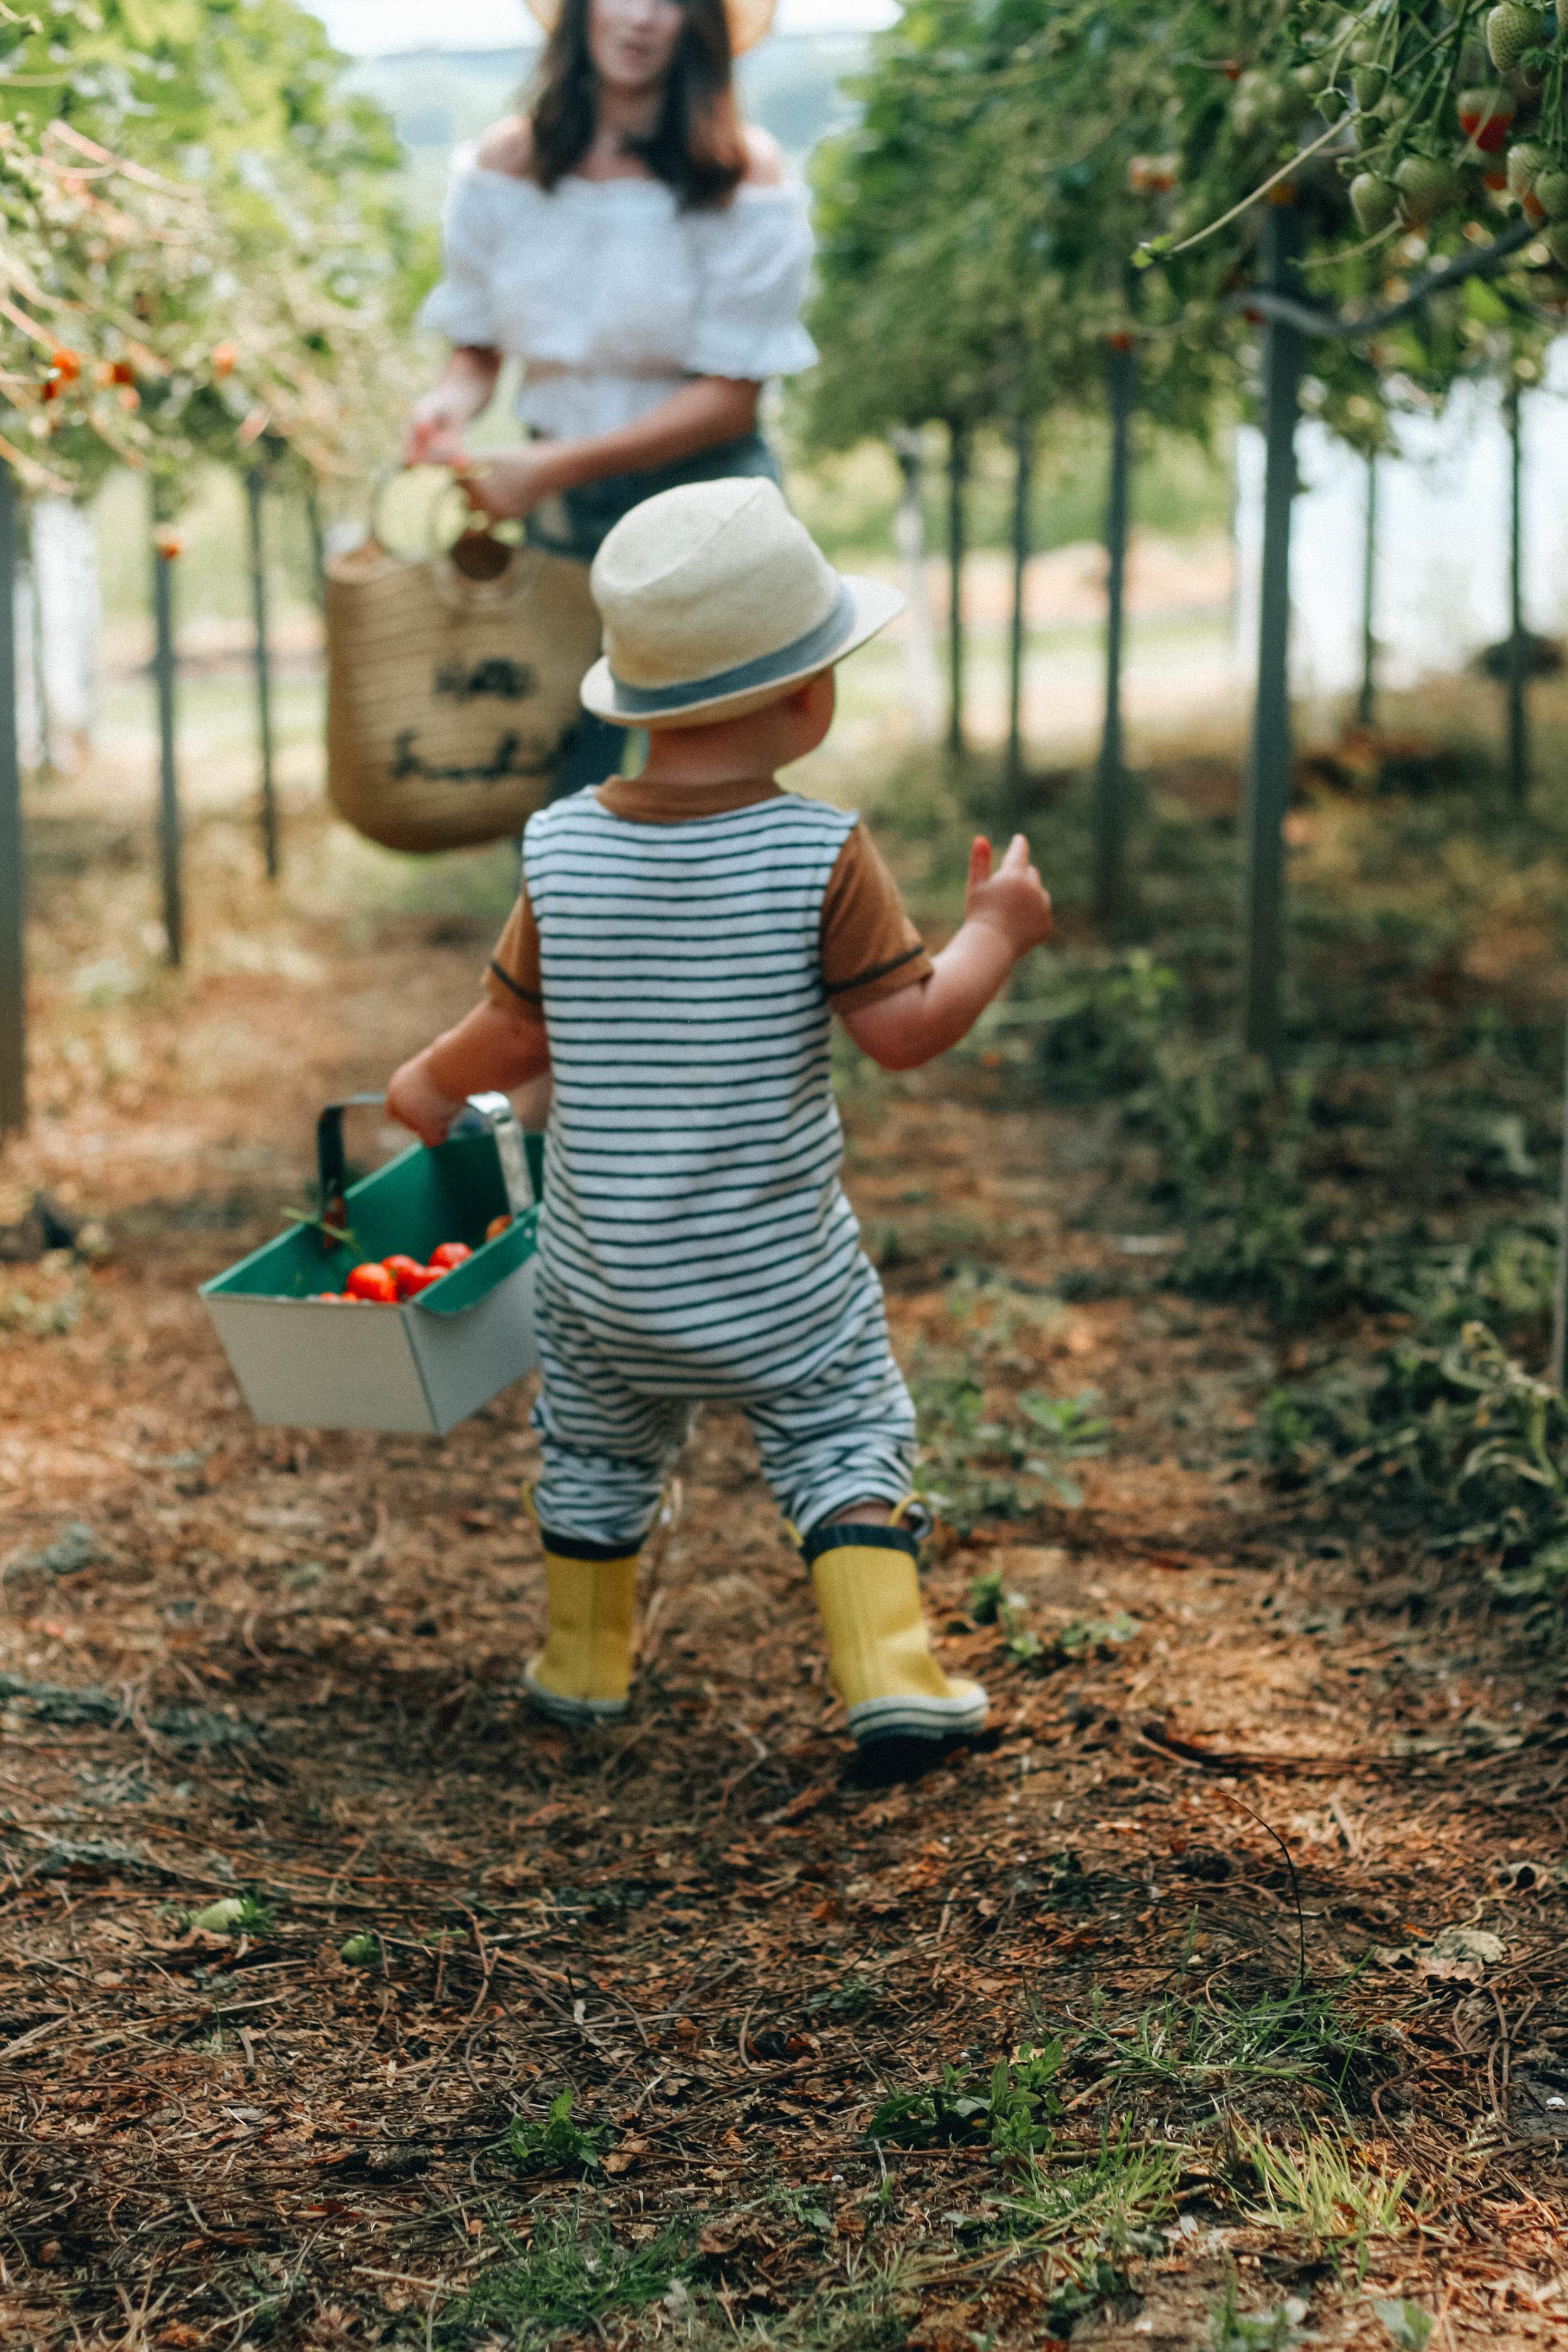 strawberry picking scotland at craigies farm edinburgh